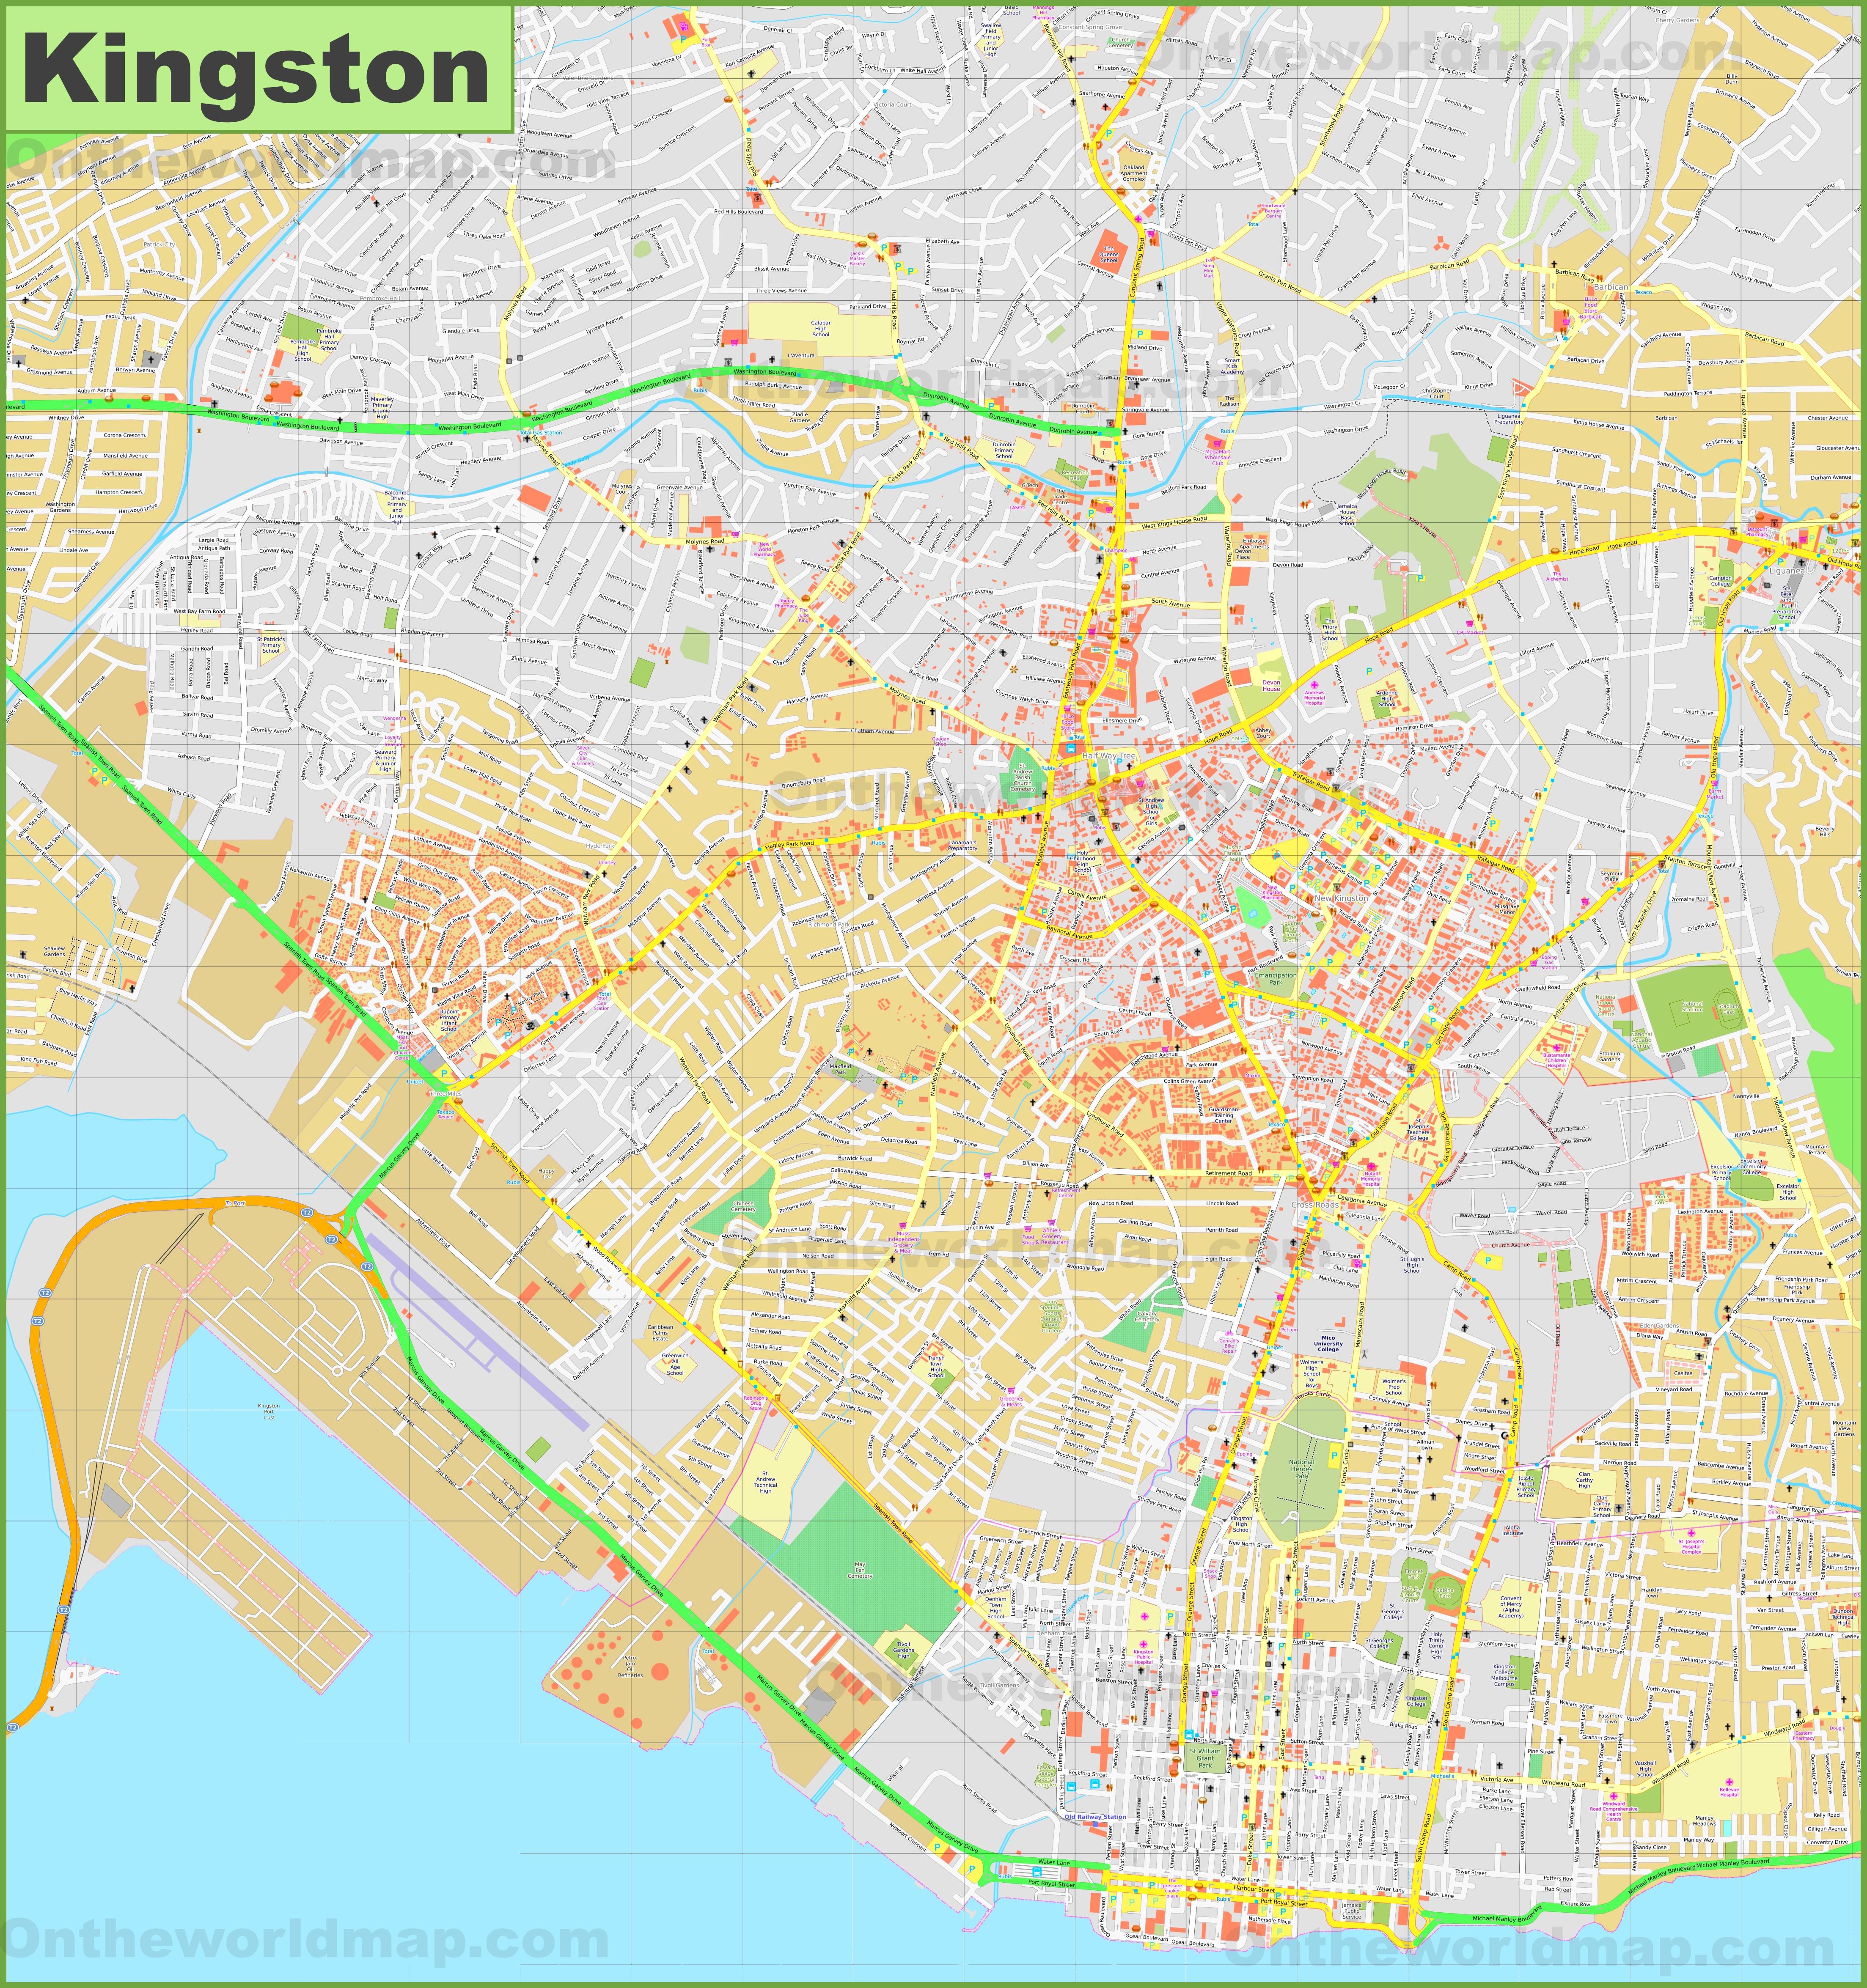 Map Of Kingston Large detailed map of Kingston Map Of Kingston